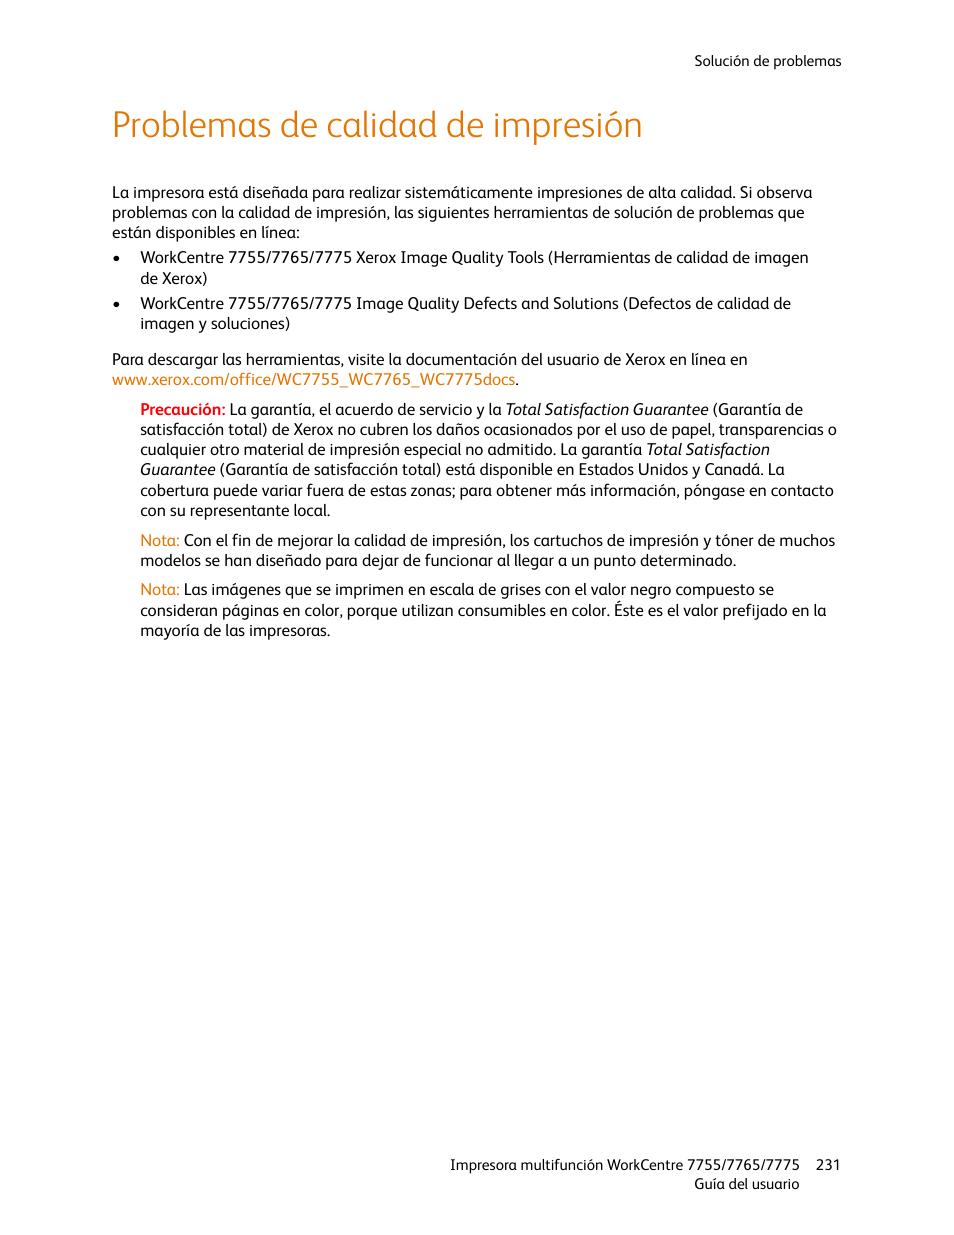 Problemas de calidad de impresión | Xerox WorkCentre 7755